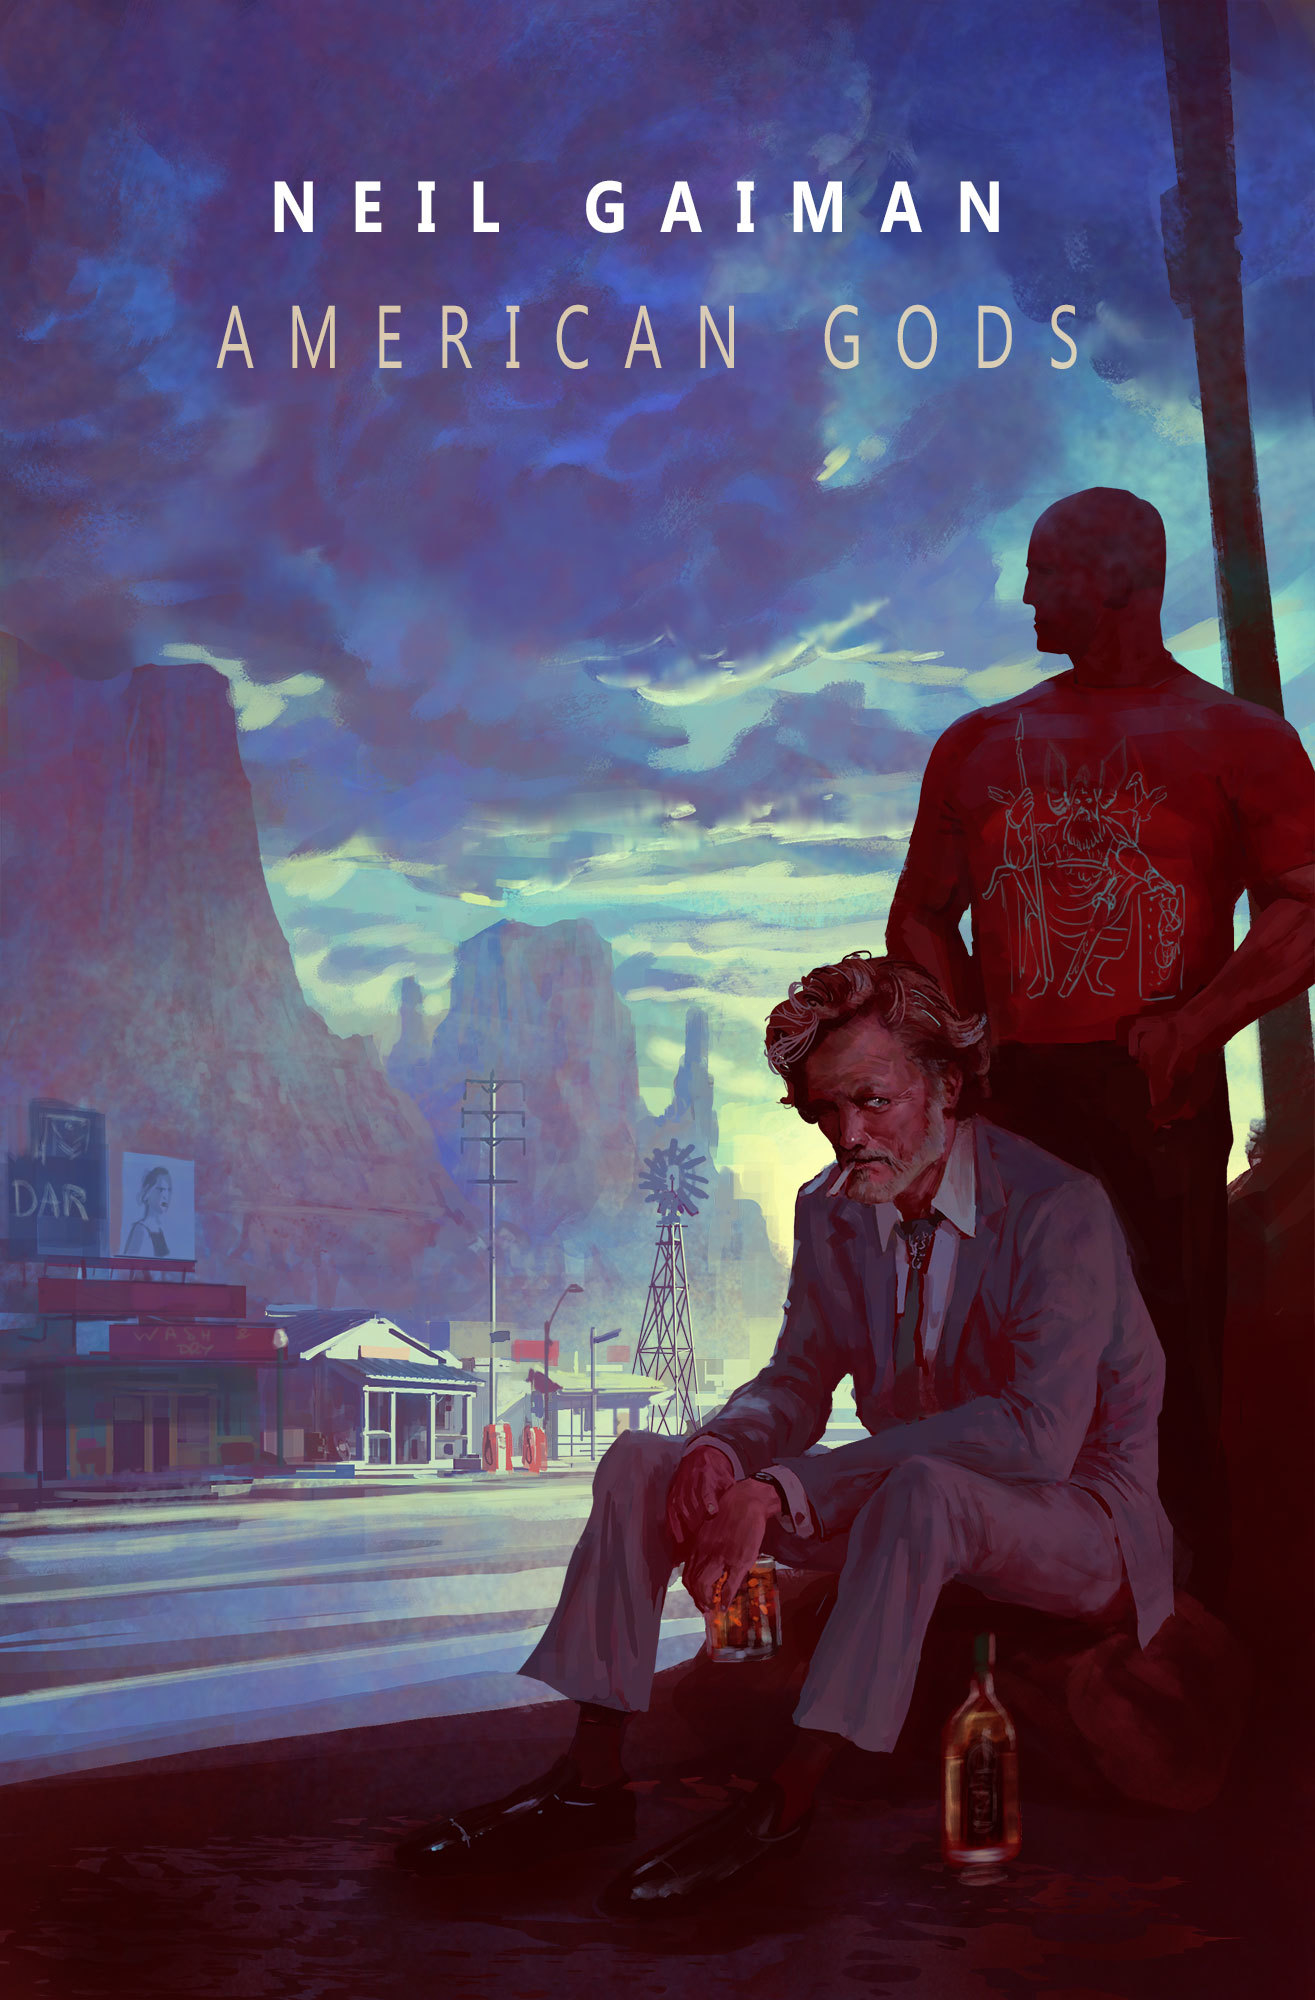 Kemar american gods 1 d0113381 6woo